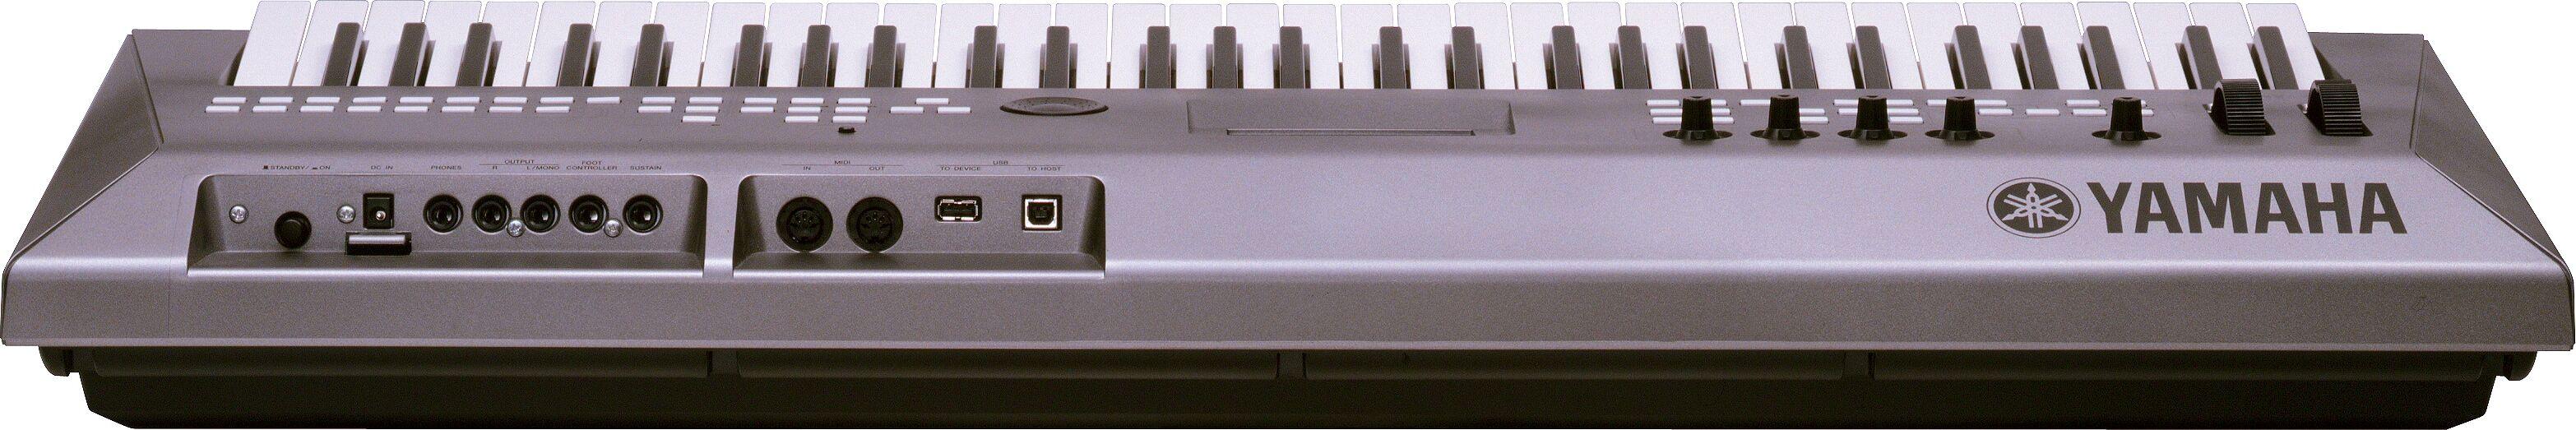 YAMAHA MM6 USB MIDI TELECHARGER PILOTE